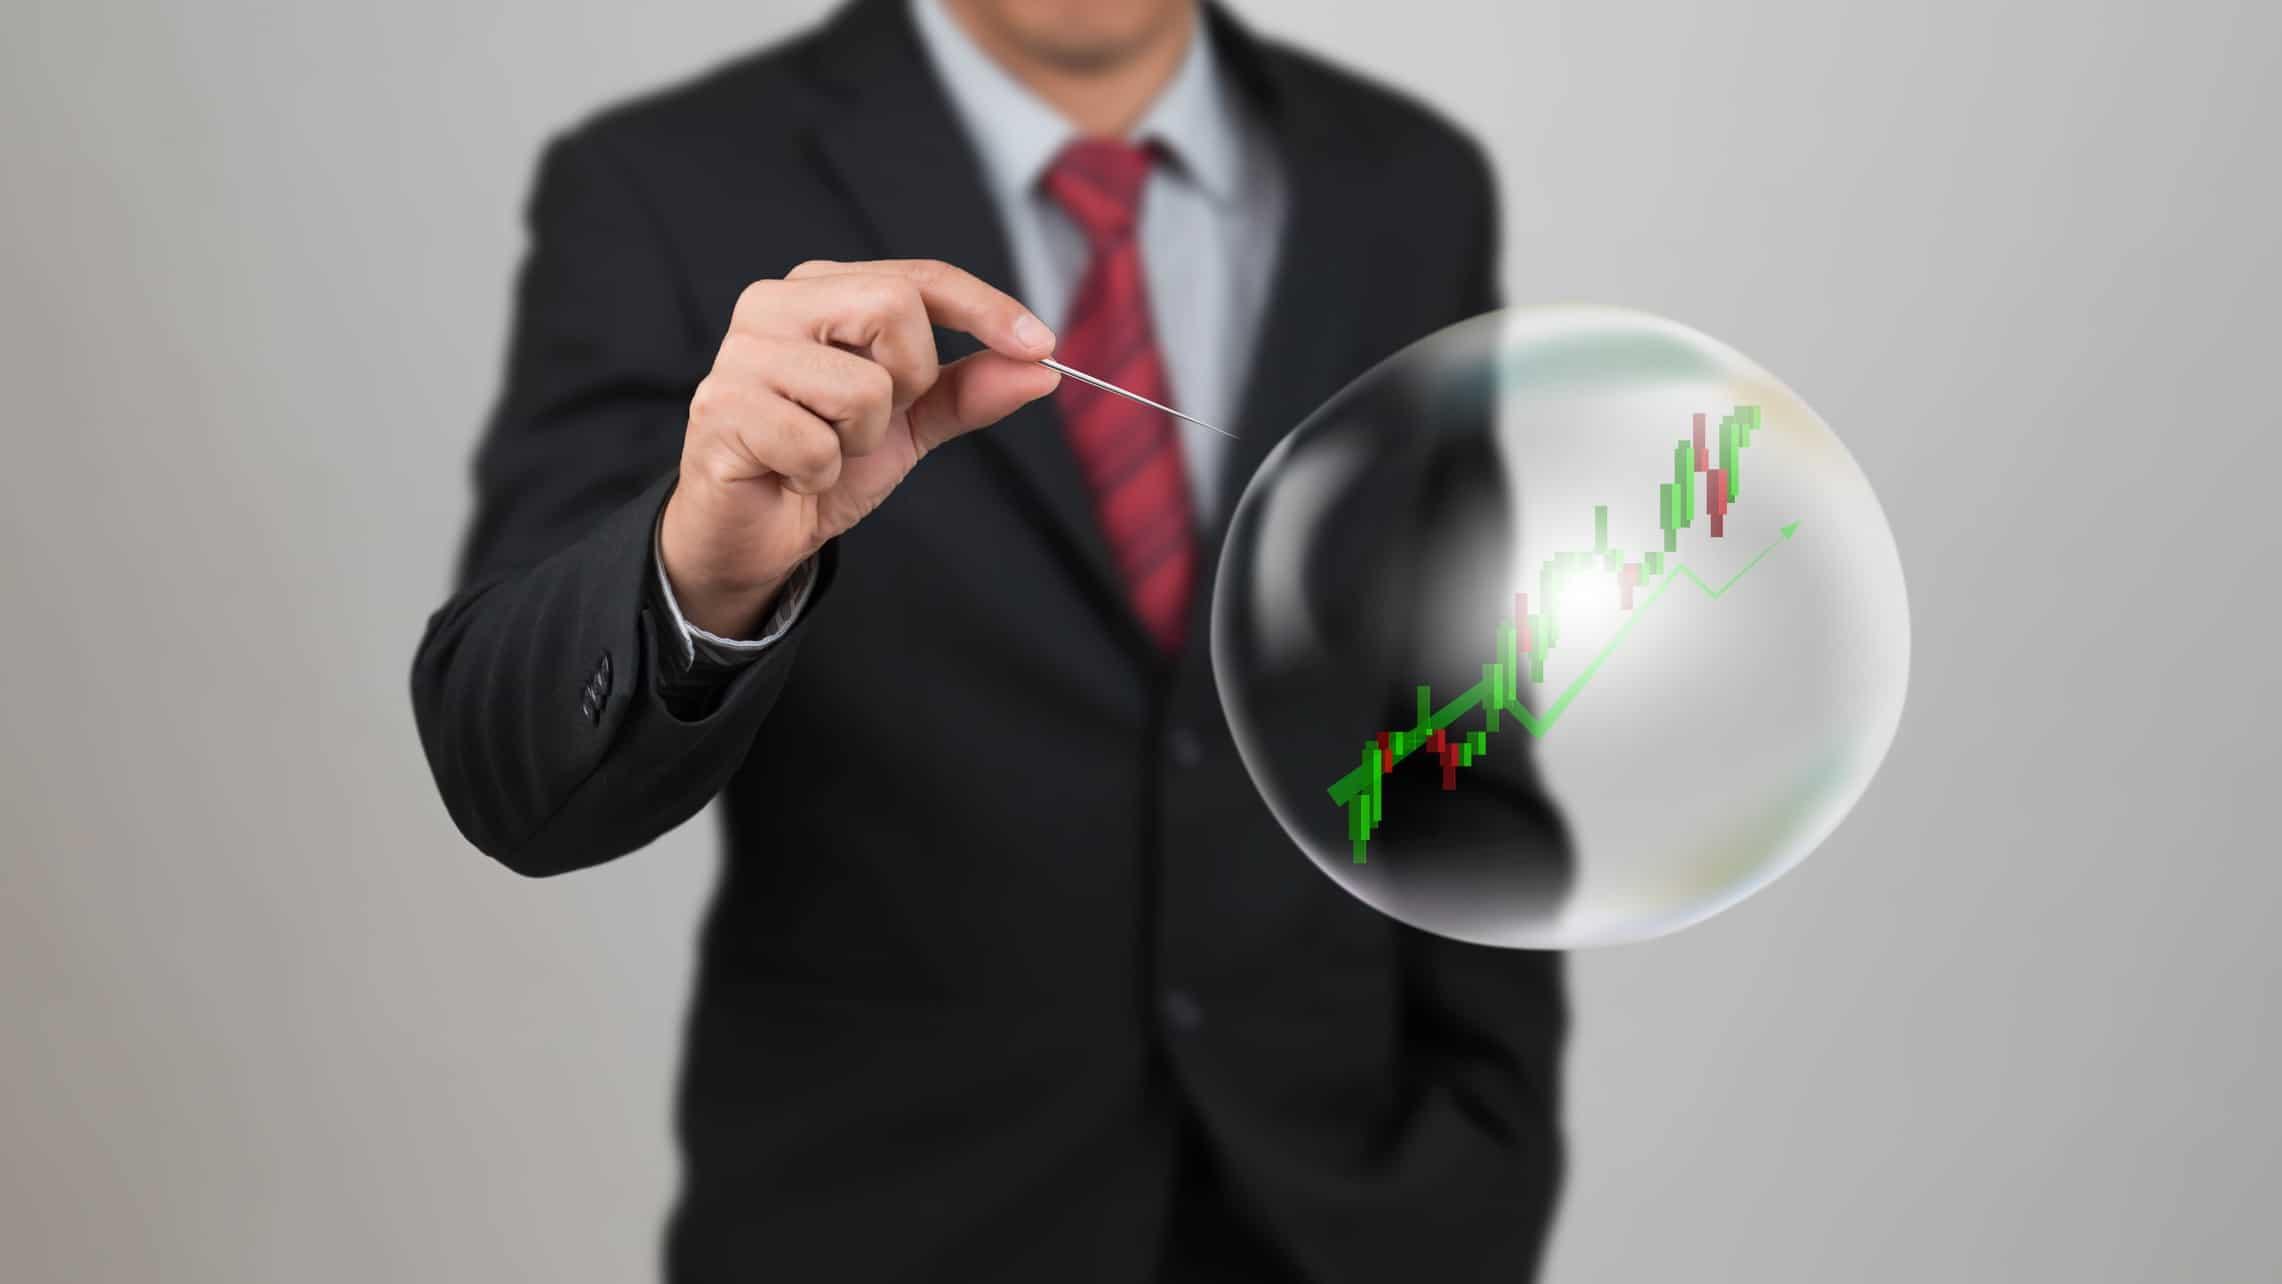 Investor pricking share market bubble